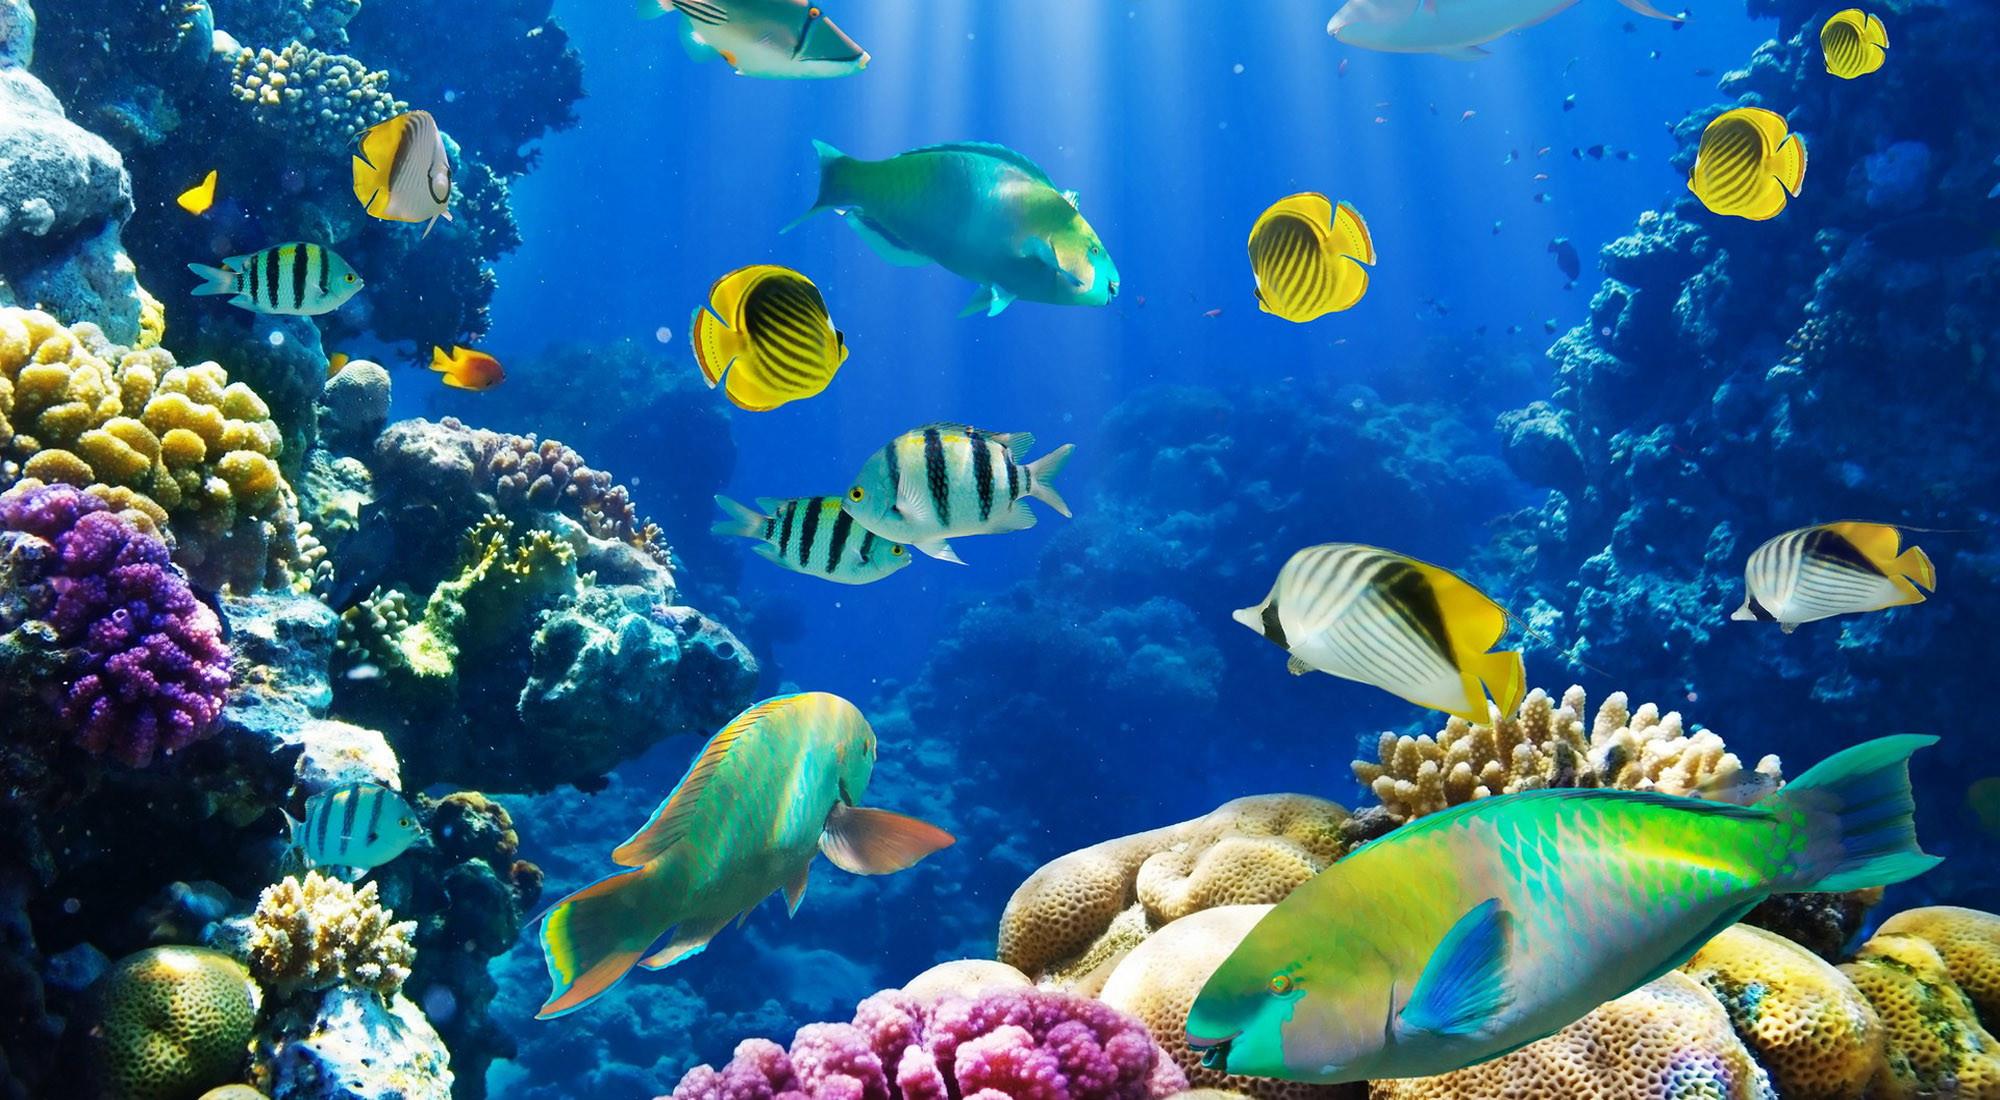 Res: 2000x1100, Animal - Fish Animal Tropical Fish Tropical Ocean Underwater Butterflyfish  Wallpaper